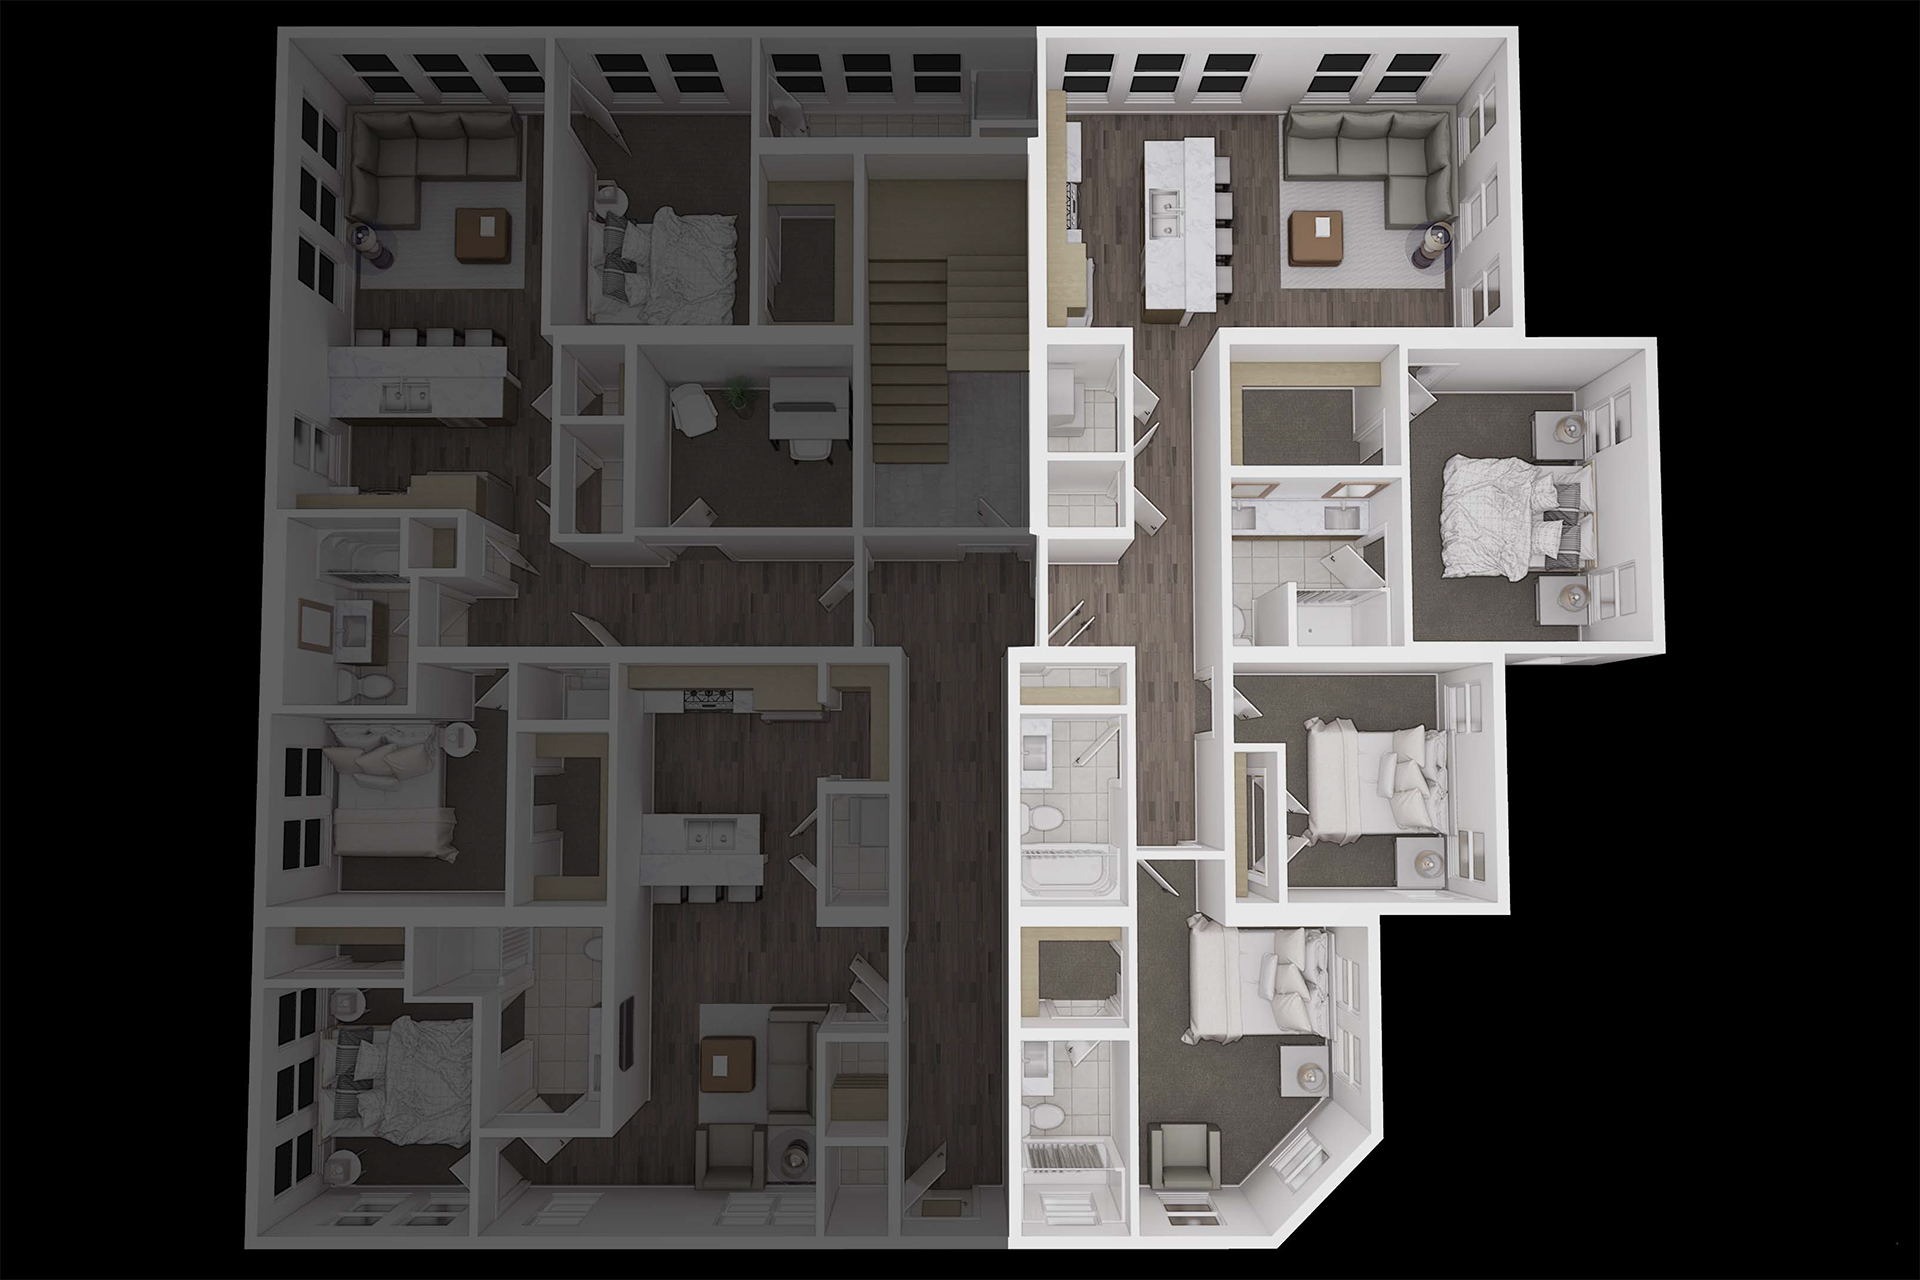 3 Bedroom Option